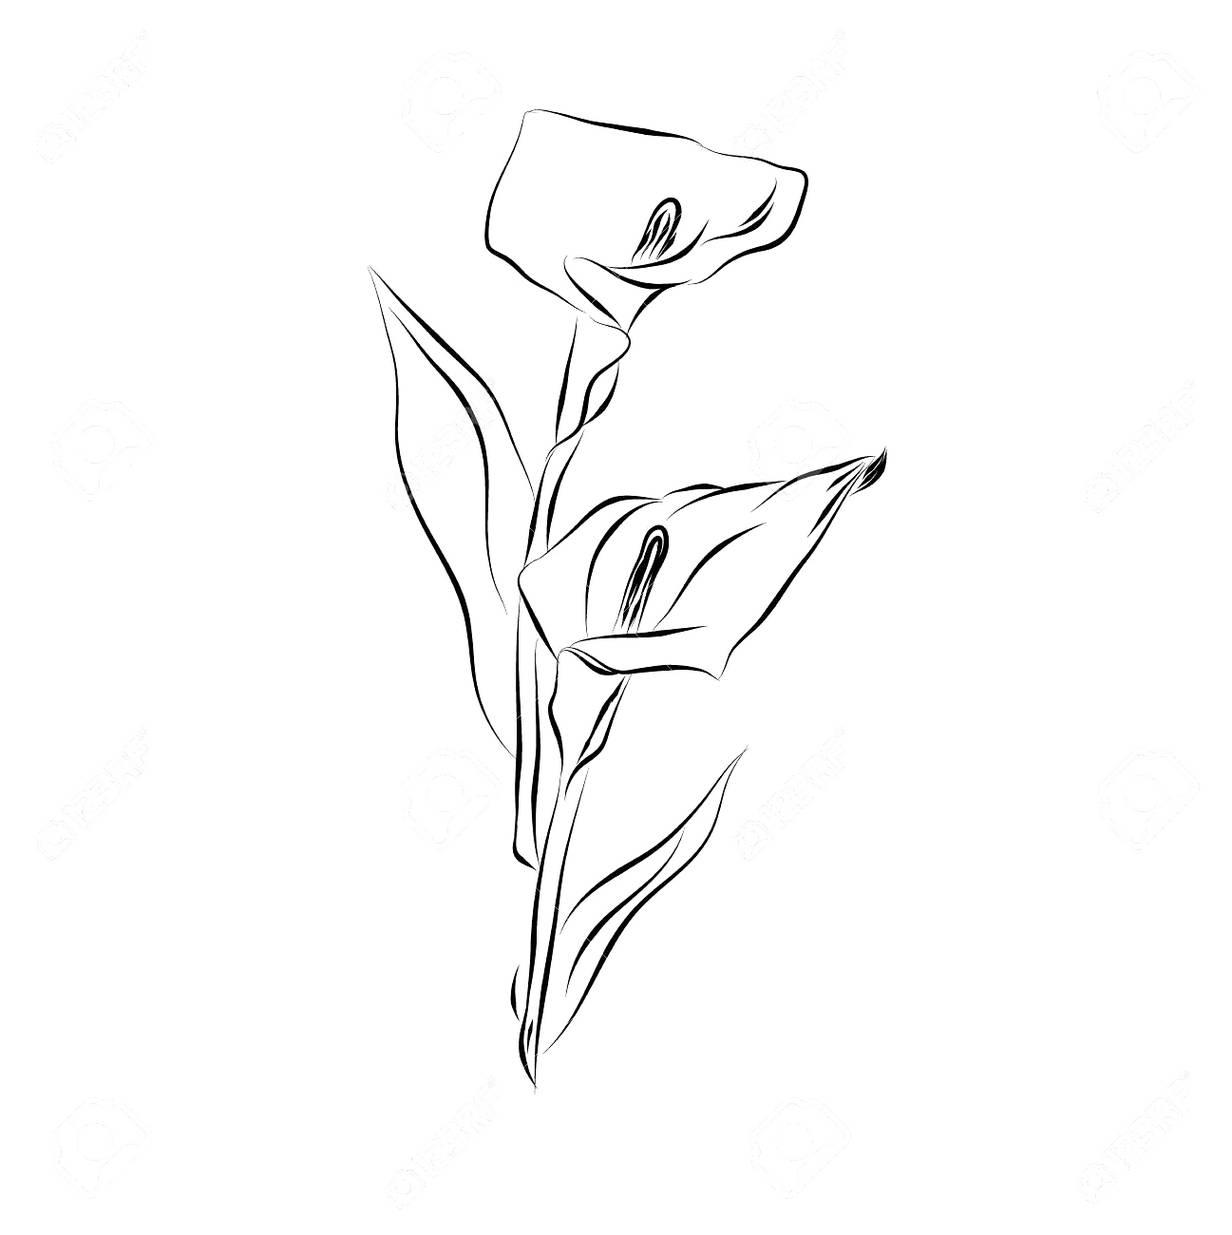 Kumpulan Mewarnai Gambar Sketsa Vas Bunga Desain Interior